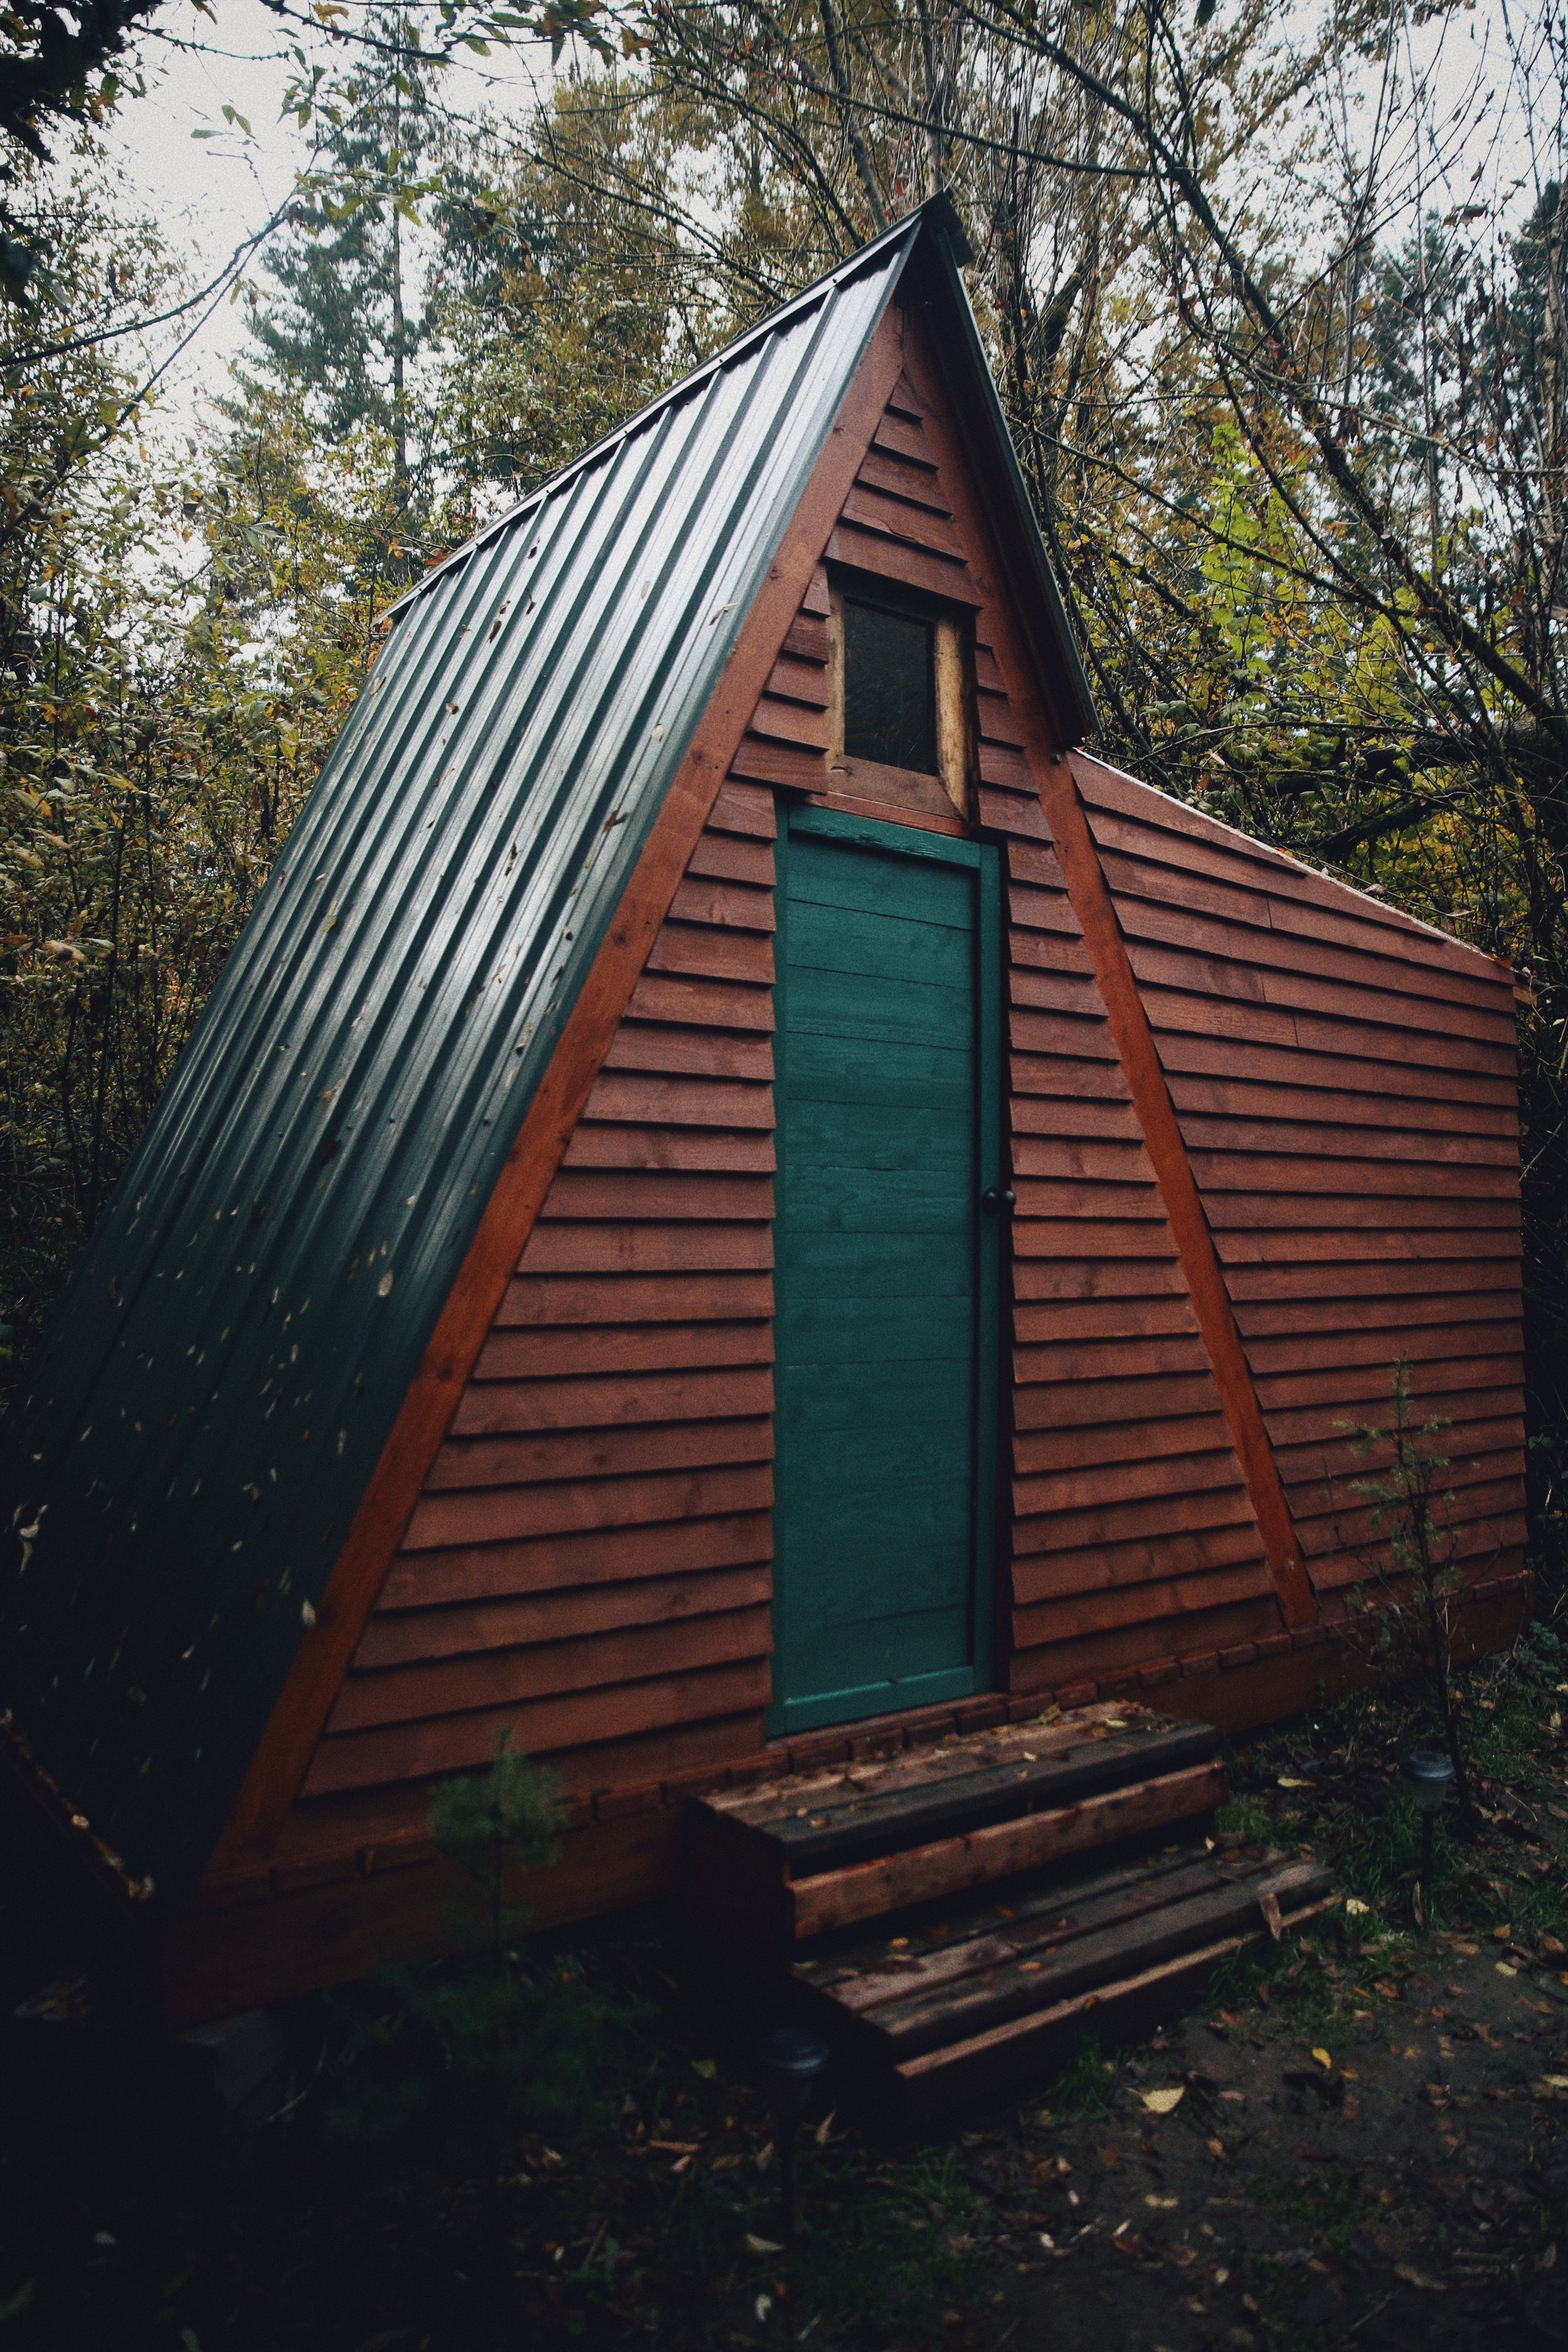 The Green Cabin